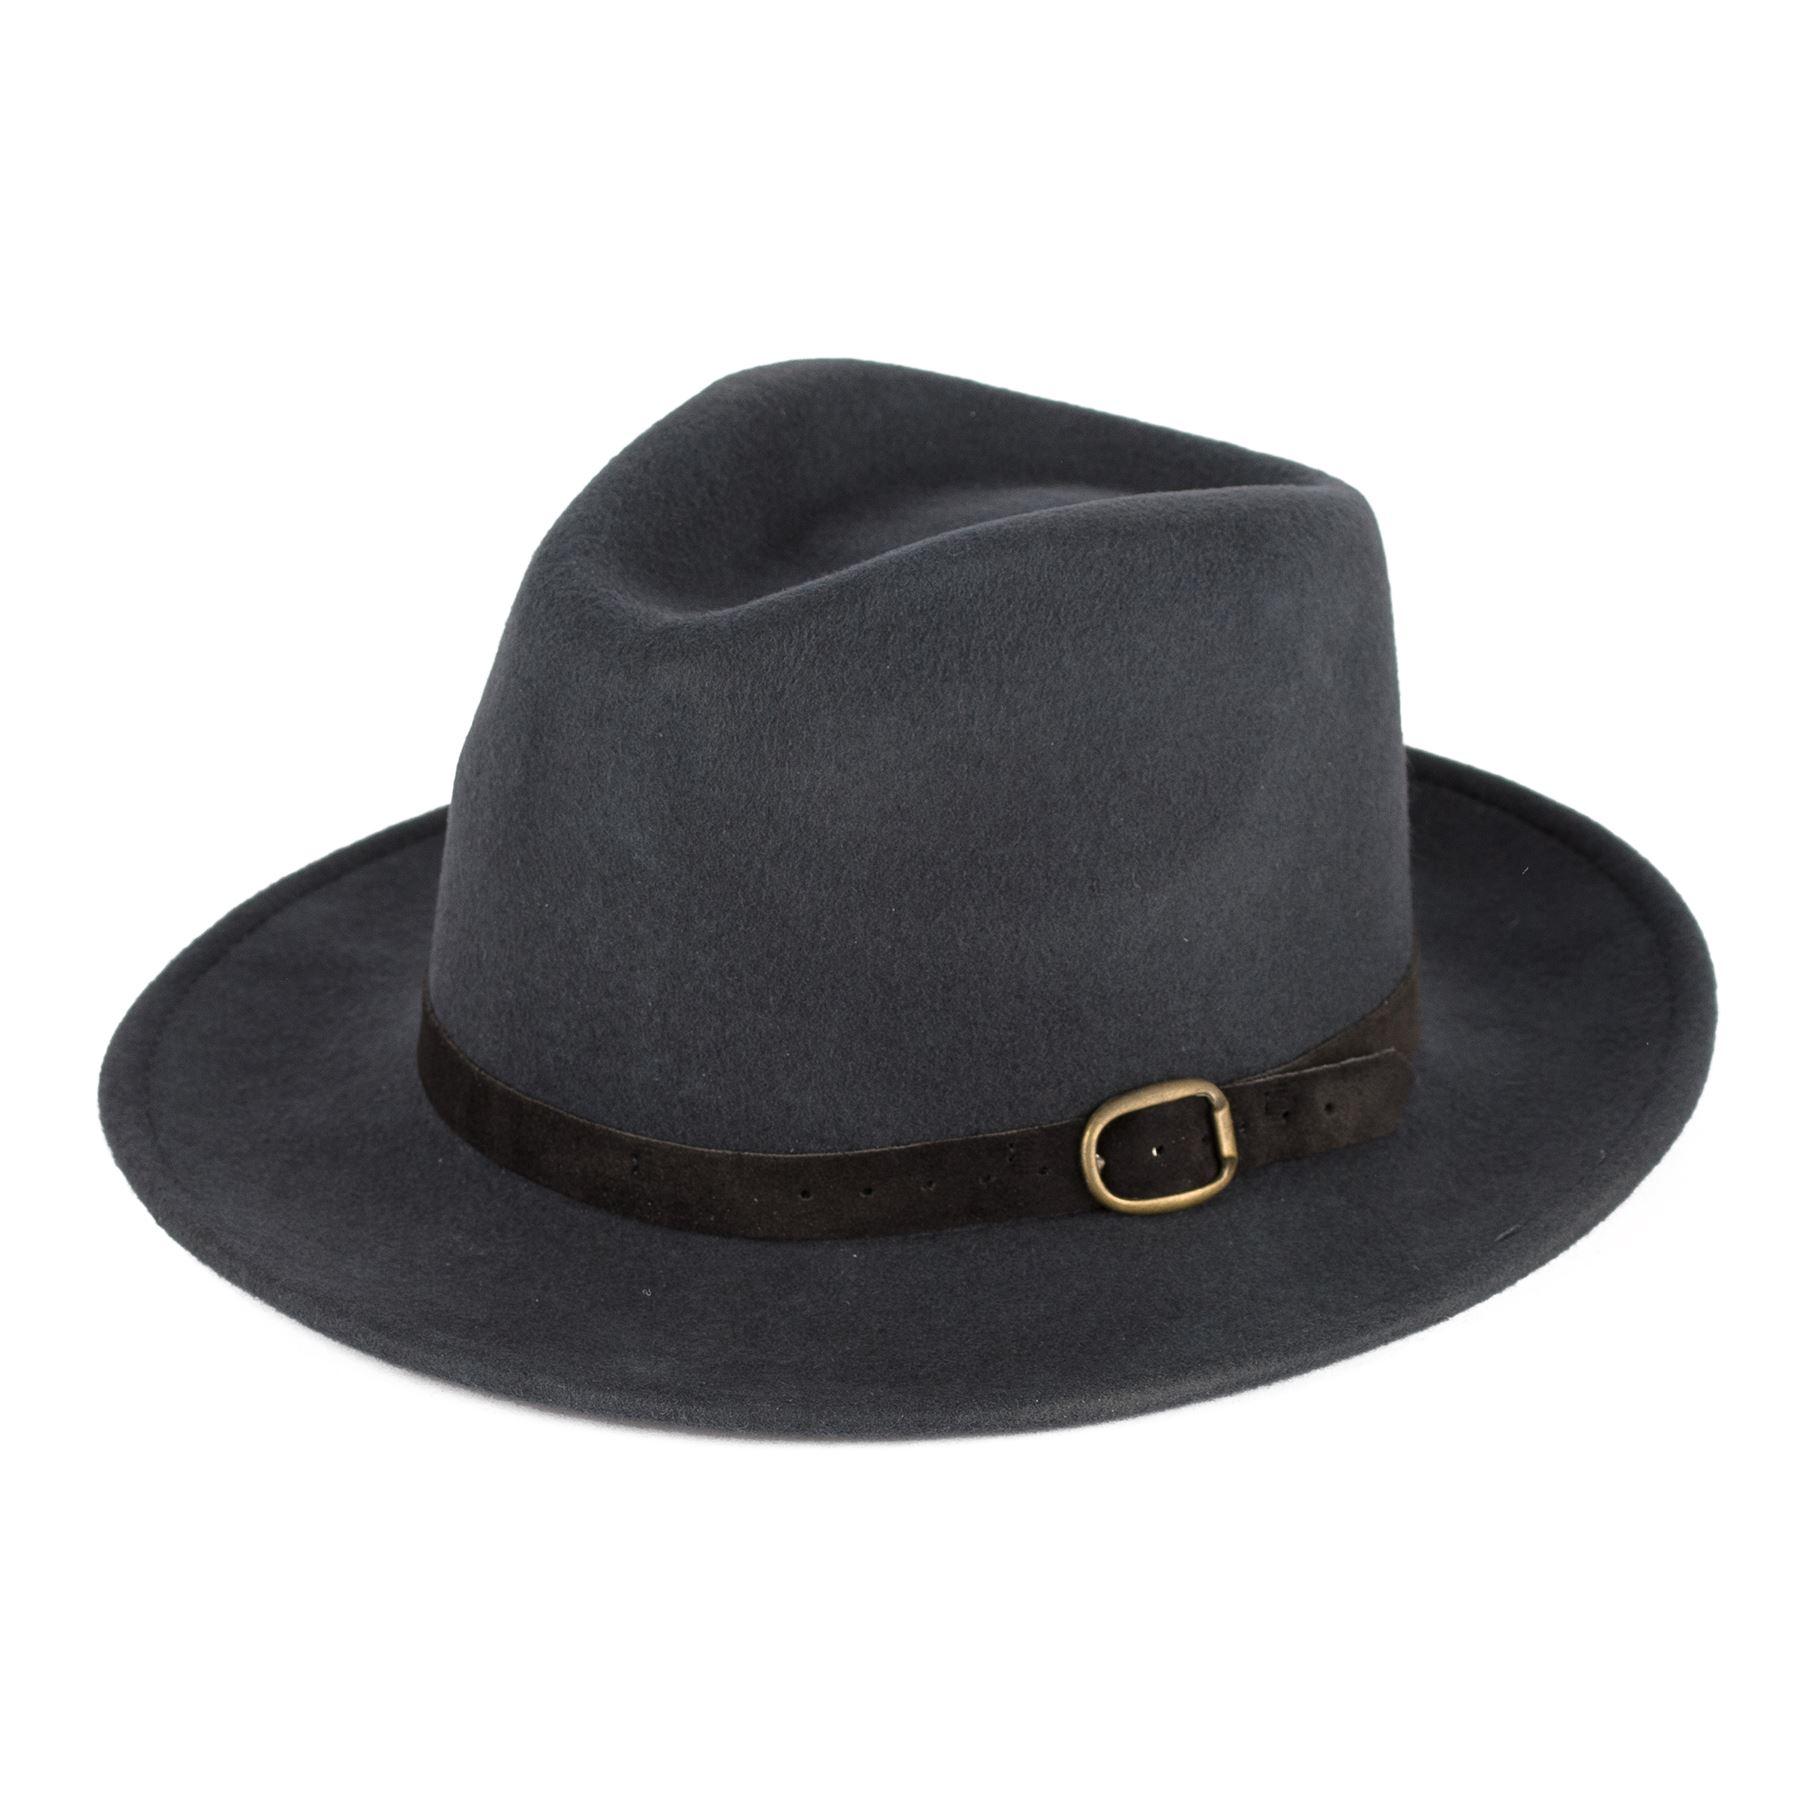 Men's Ladies Handmade Fedora Hat Made In Italy 100% Wool